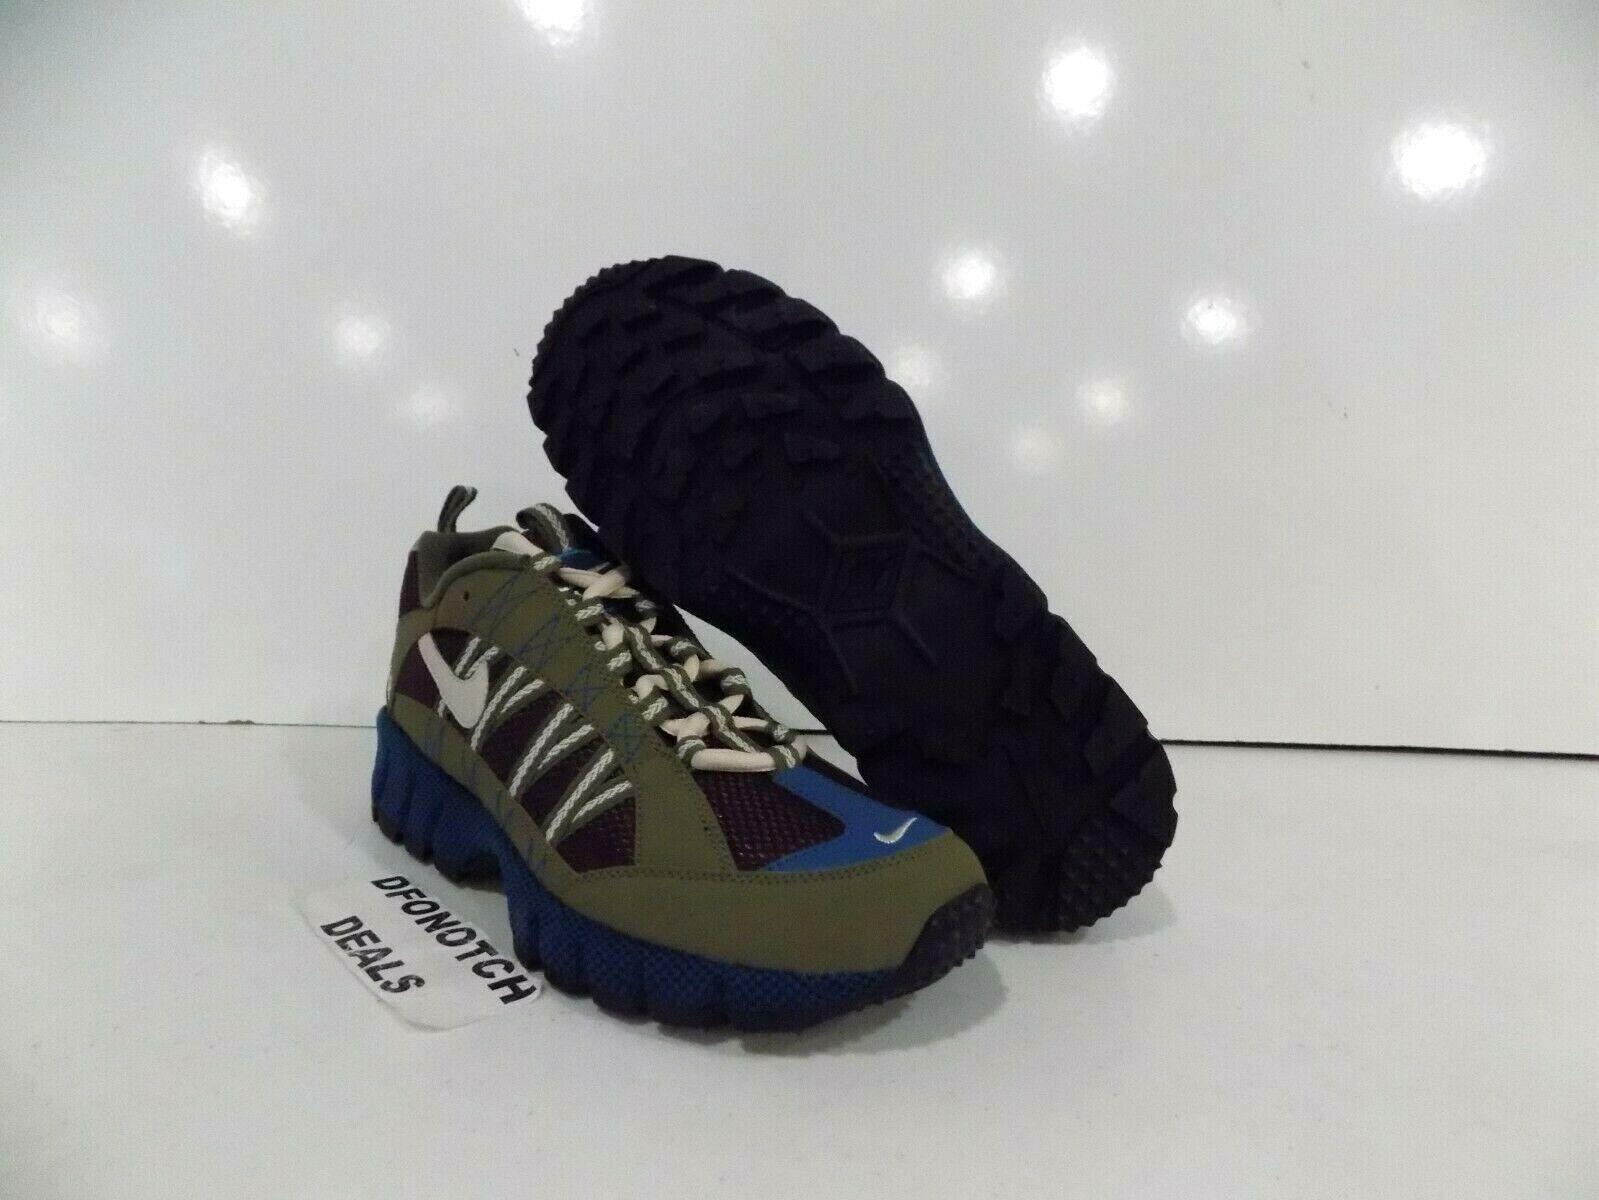 Nike Air Humara '17 Trail Men's Sz 8.5, 10 Olive Desert Sand AJ1102 200 NEW  140